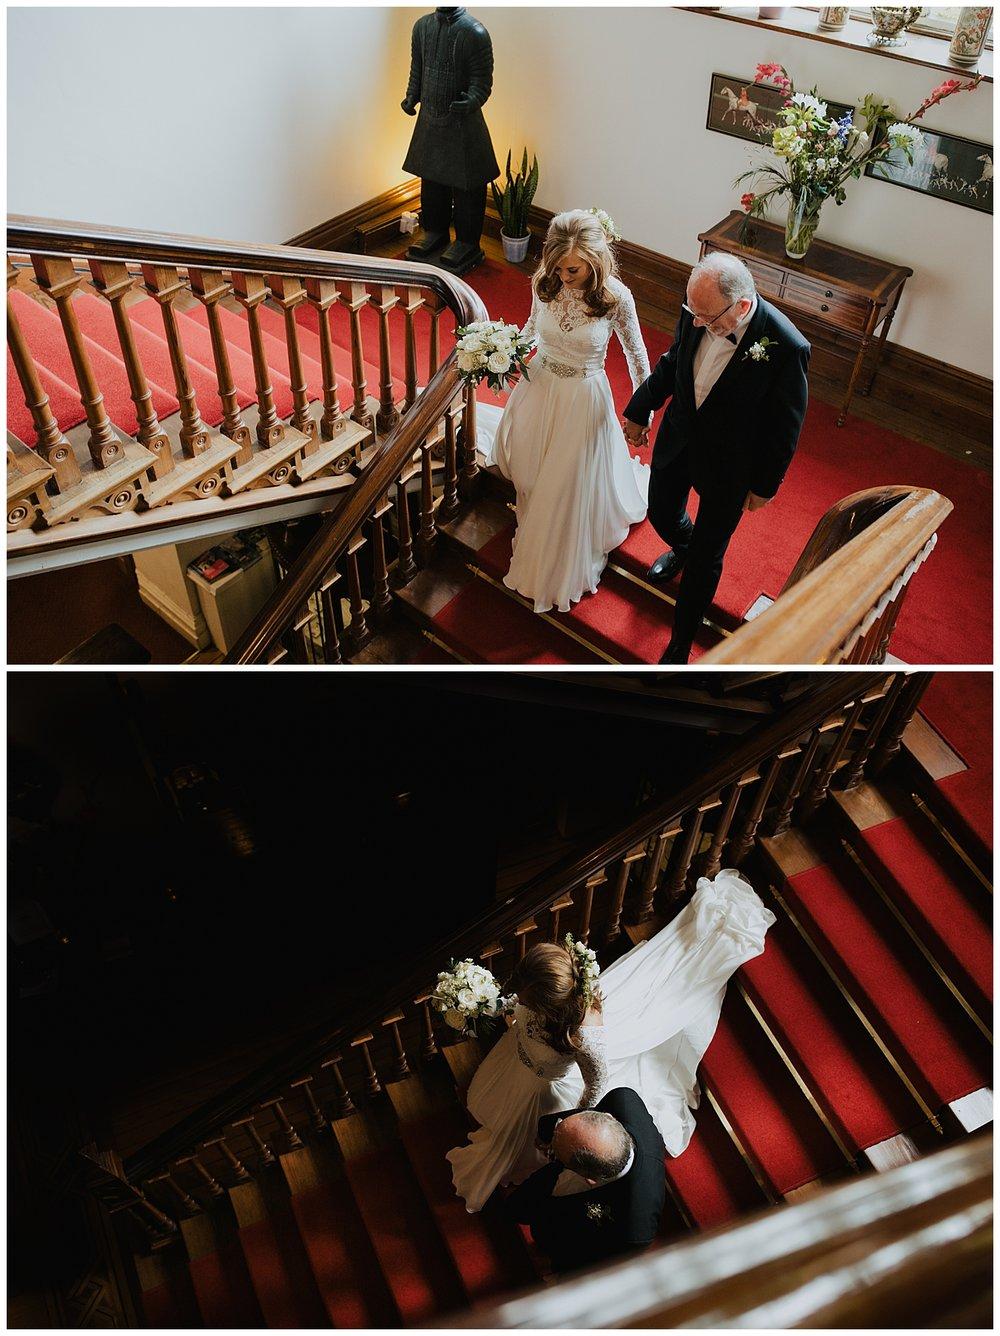 a&c_tinakilly_black_tie_wedding_photographer_livia_figueiredo_68.jpg